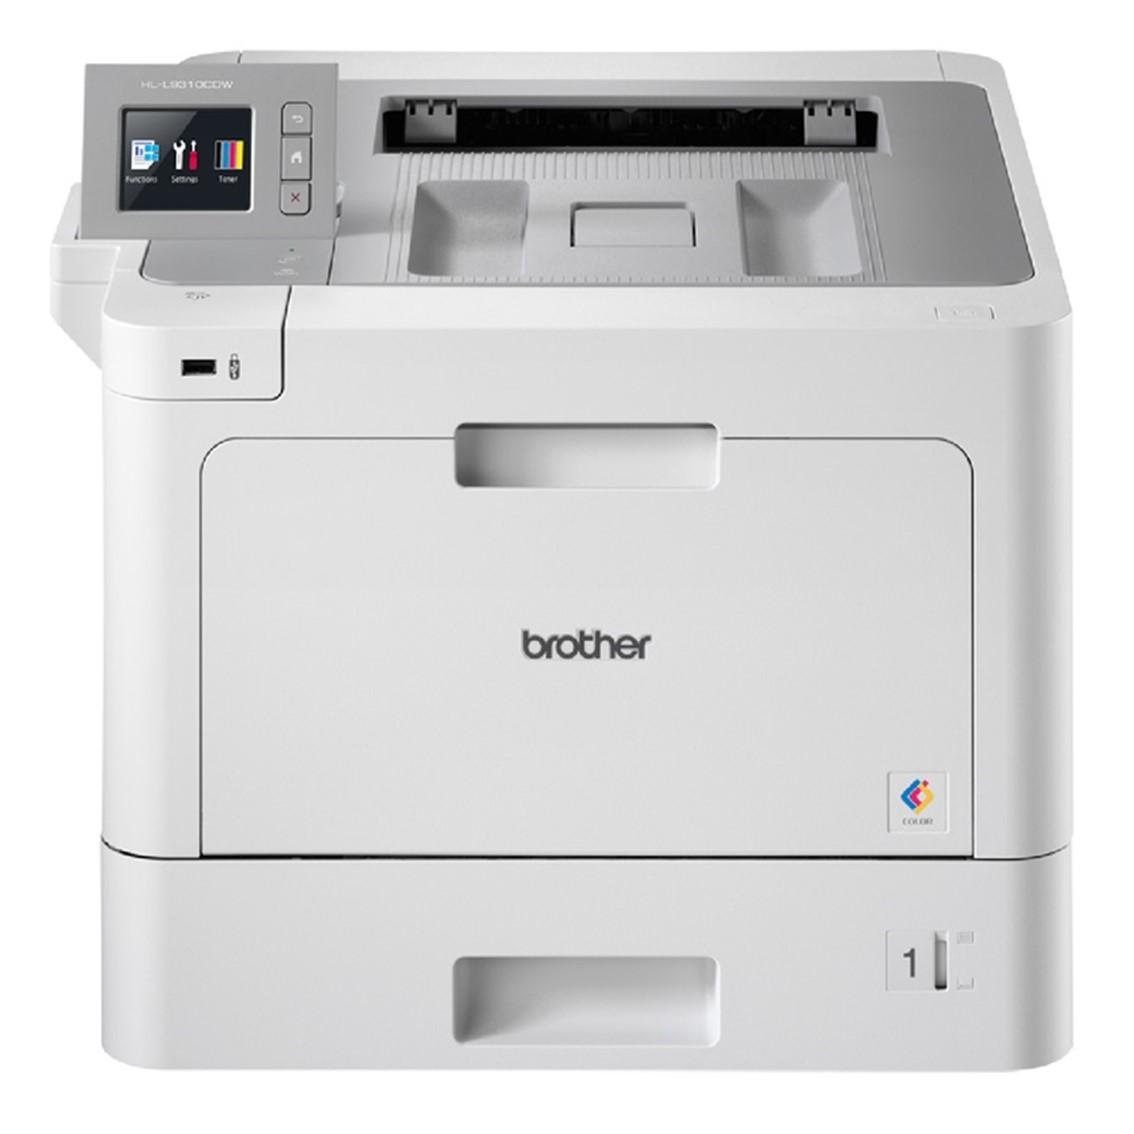 Impresora brother laser - led color hll9310cdw a4 -  31ppm -  1gb -  usb -  duplex impresion -  nfc -  wifi -  red cableada -  conectividad movil - bandeja 250 hojas + multipropósito 50 hojas